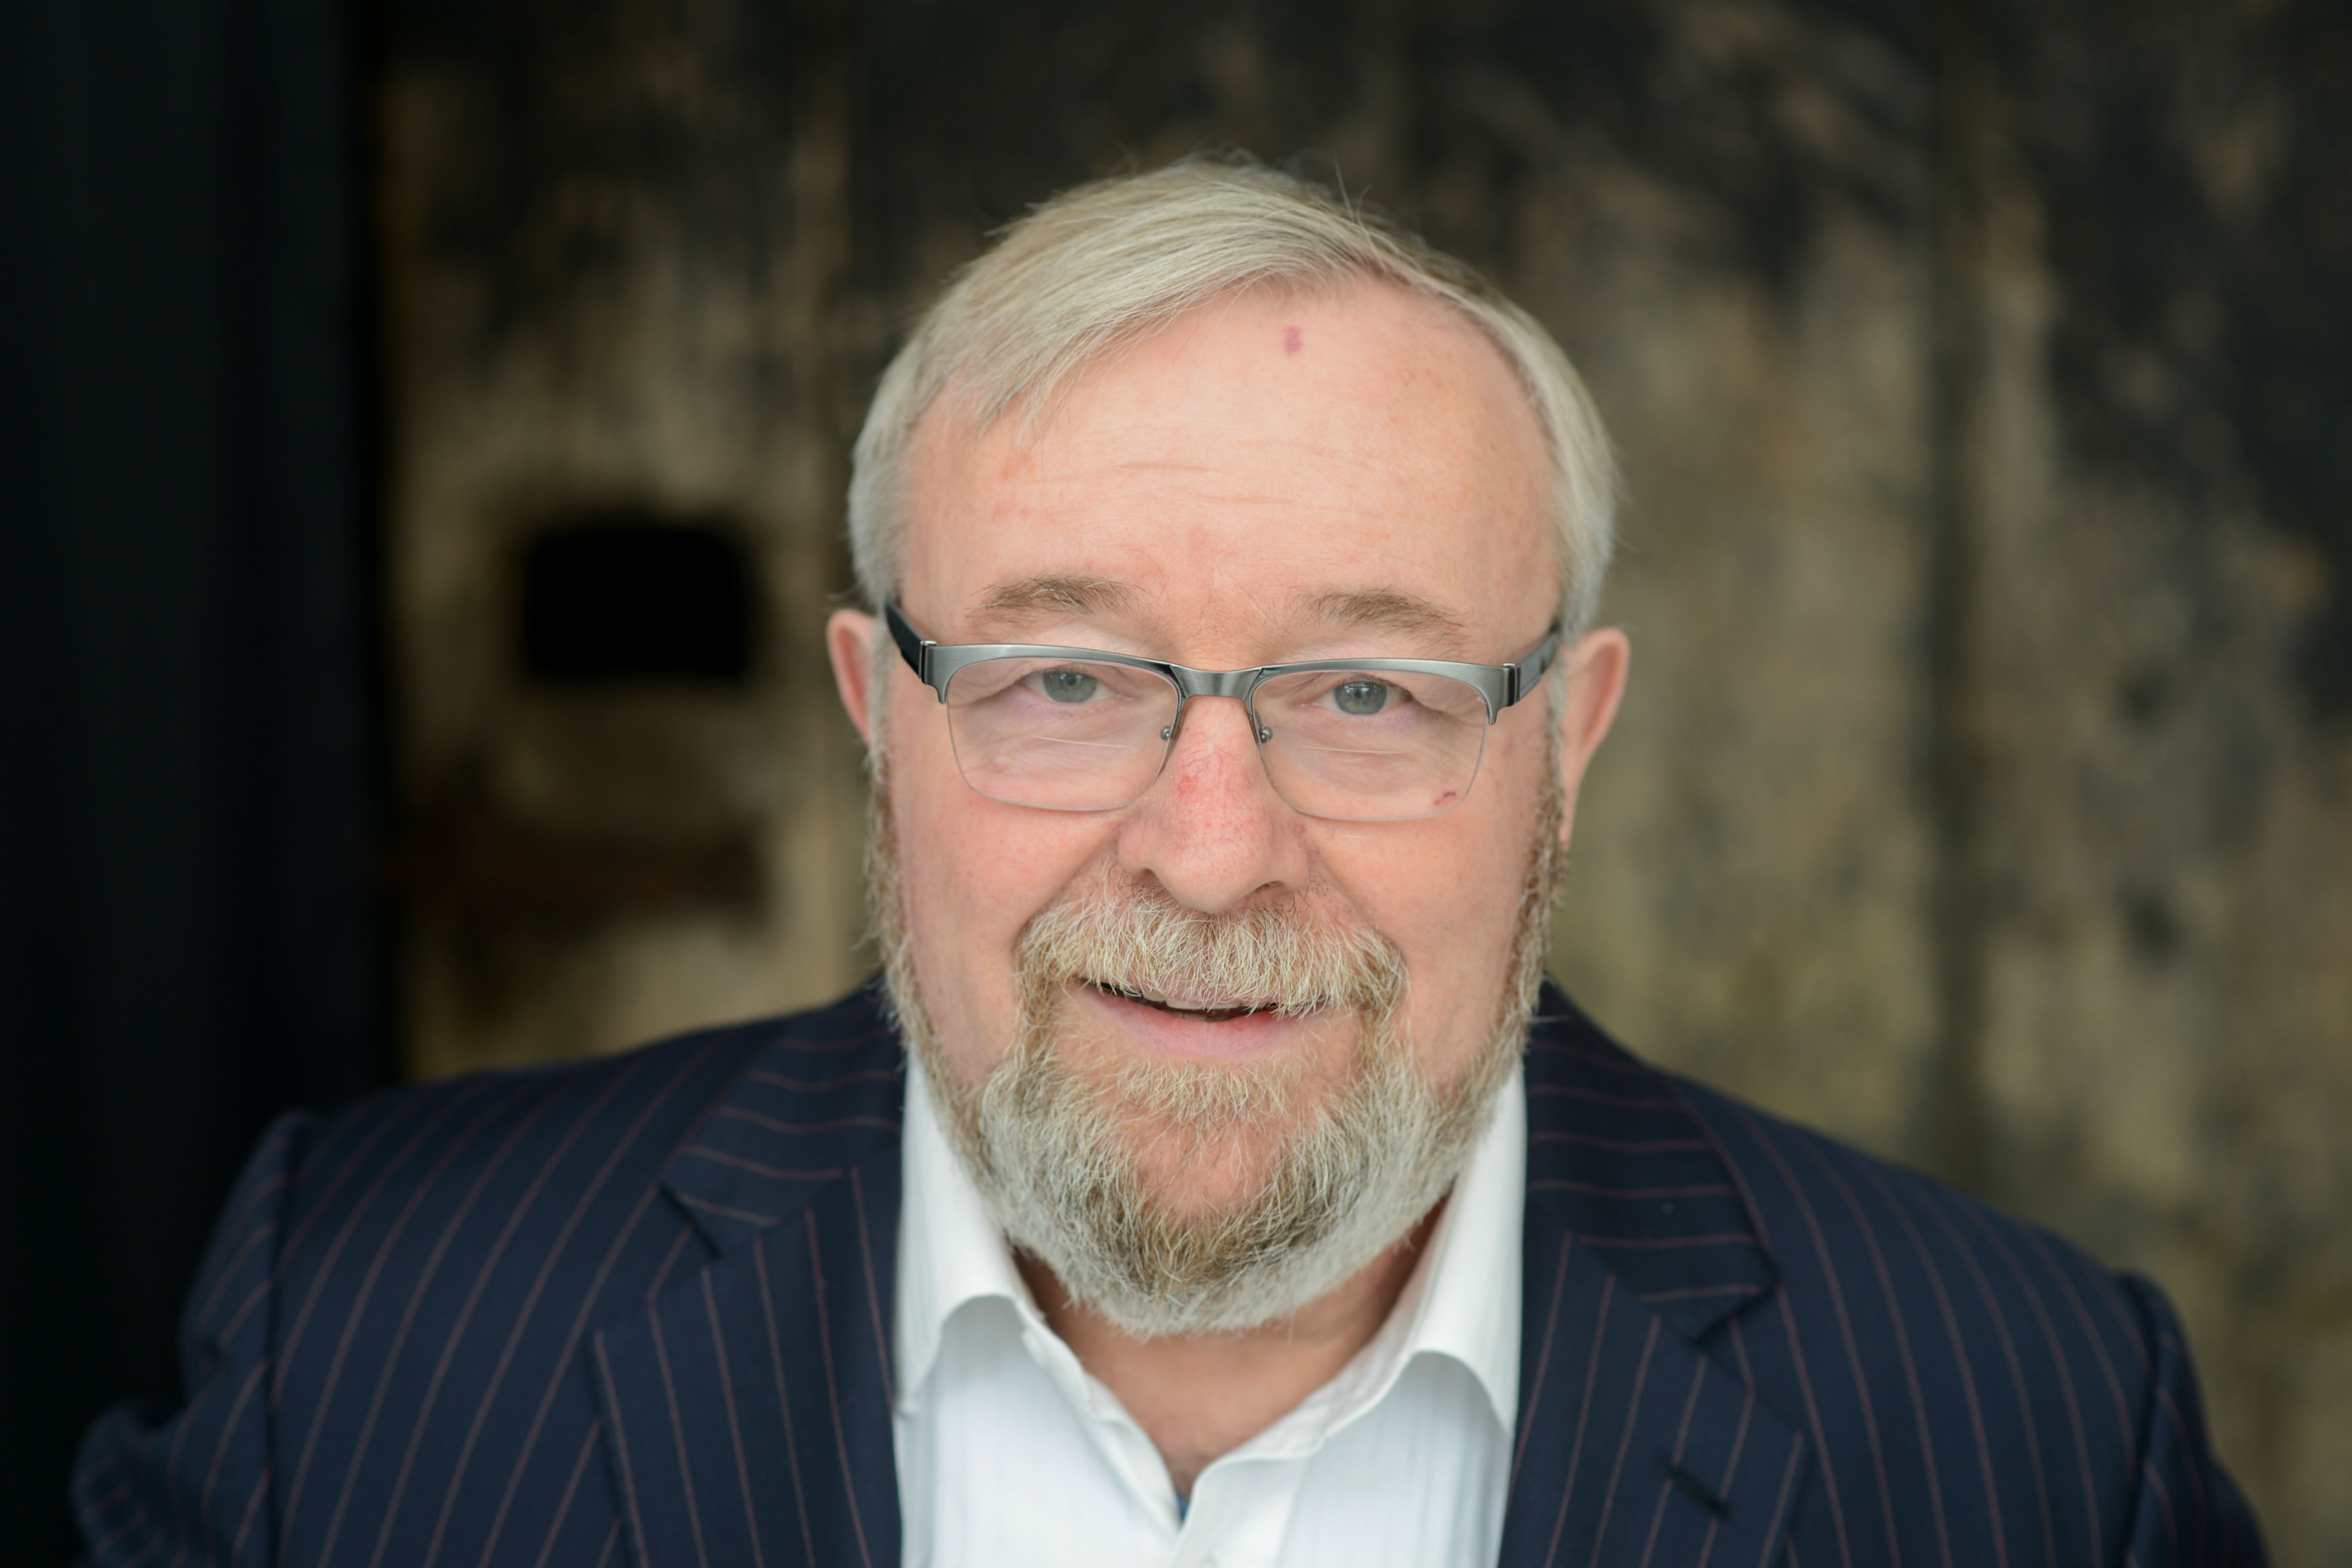 Bill Somerton Supply Chain Consultant for Bisham